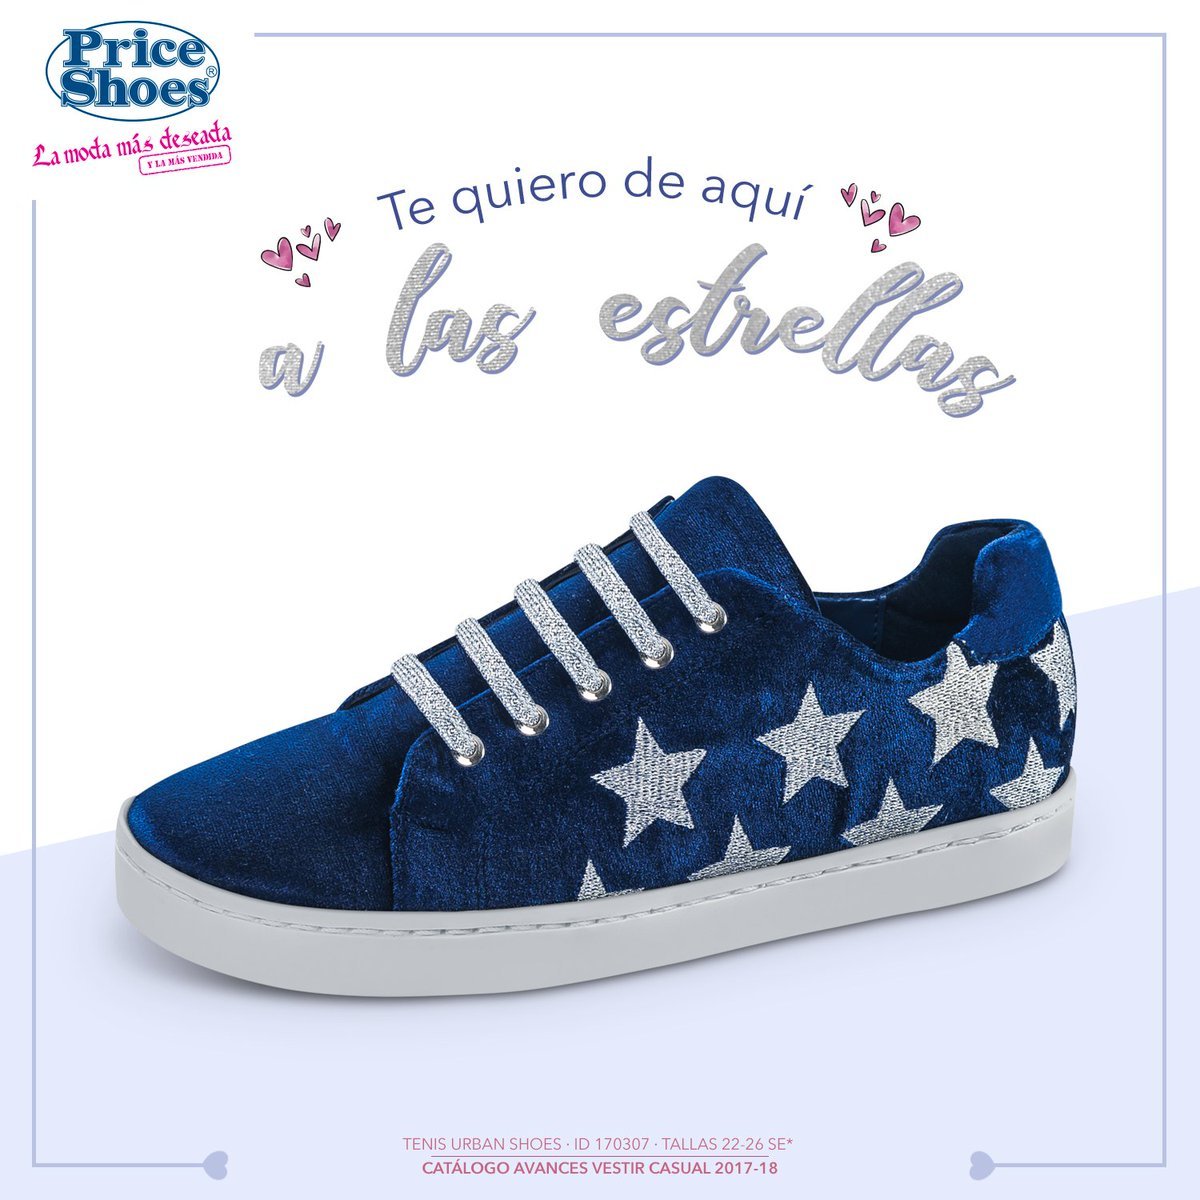 Price Shoes On Twitter Siempre Es Un Buen Momento Para